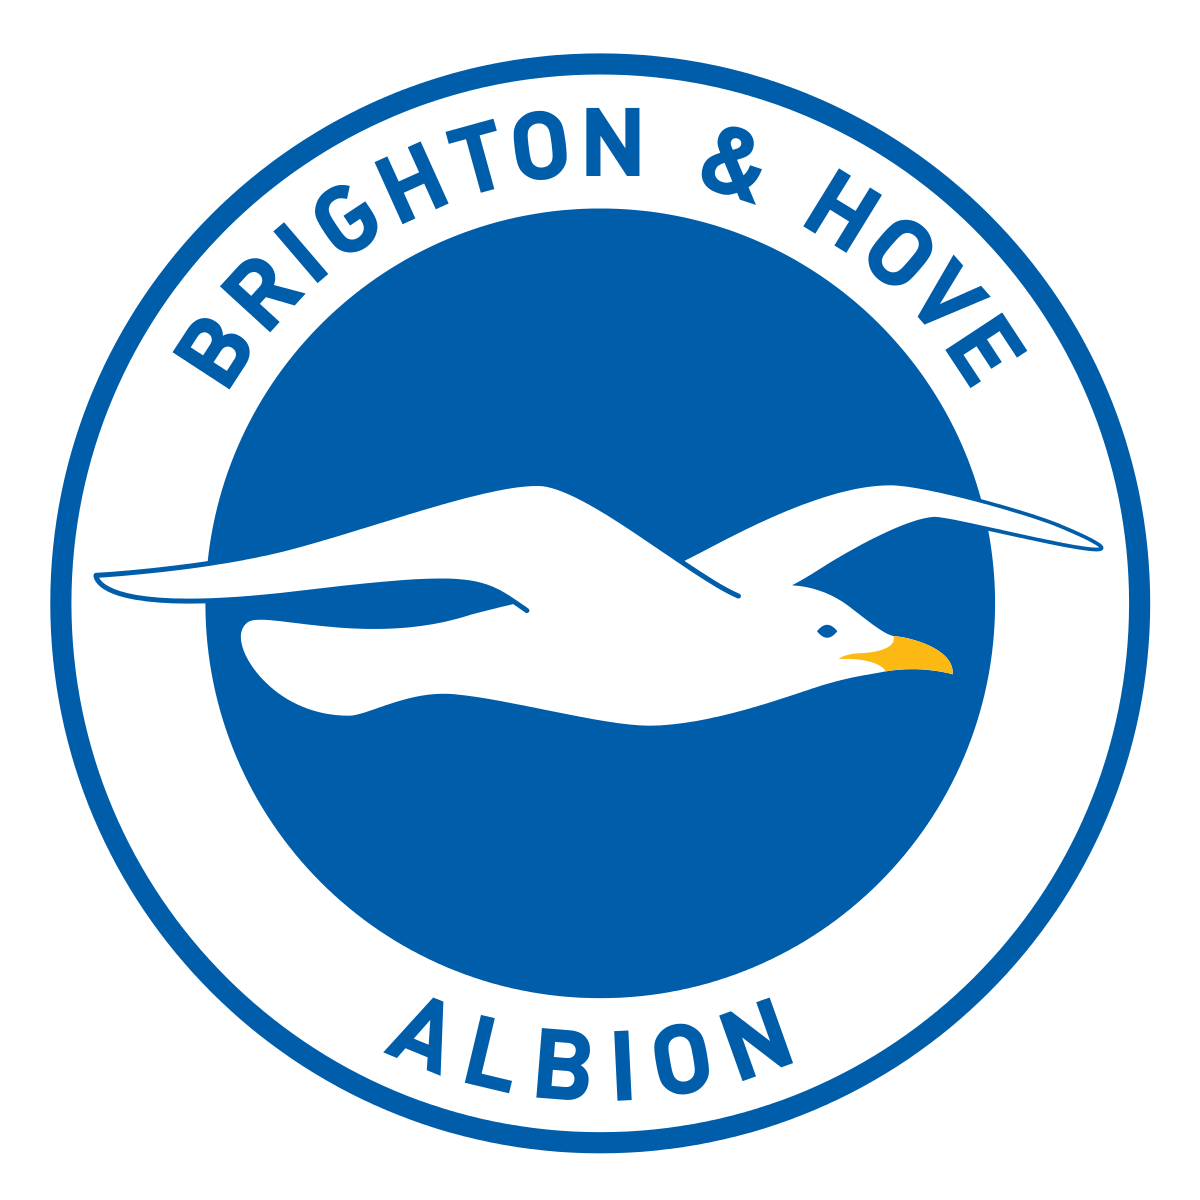 Brighton (w) team logo